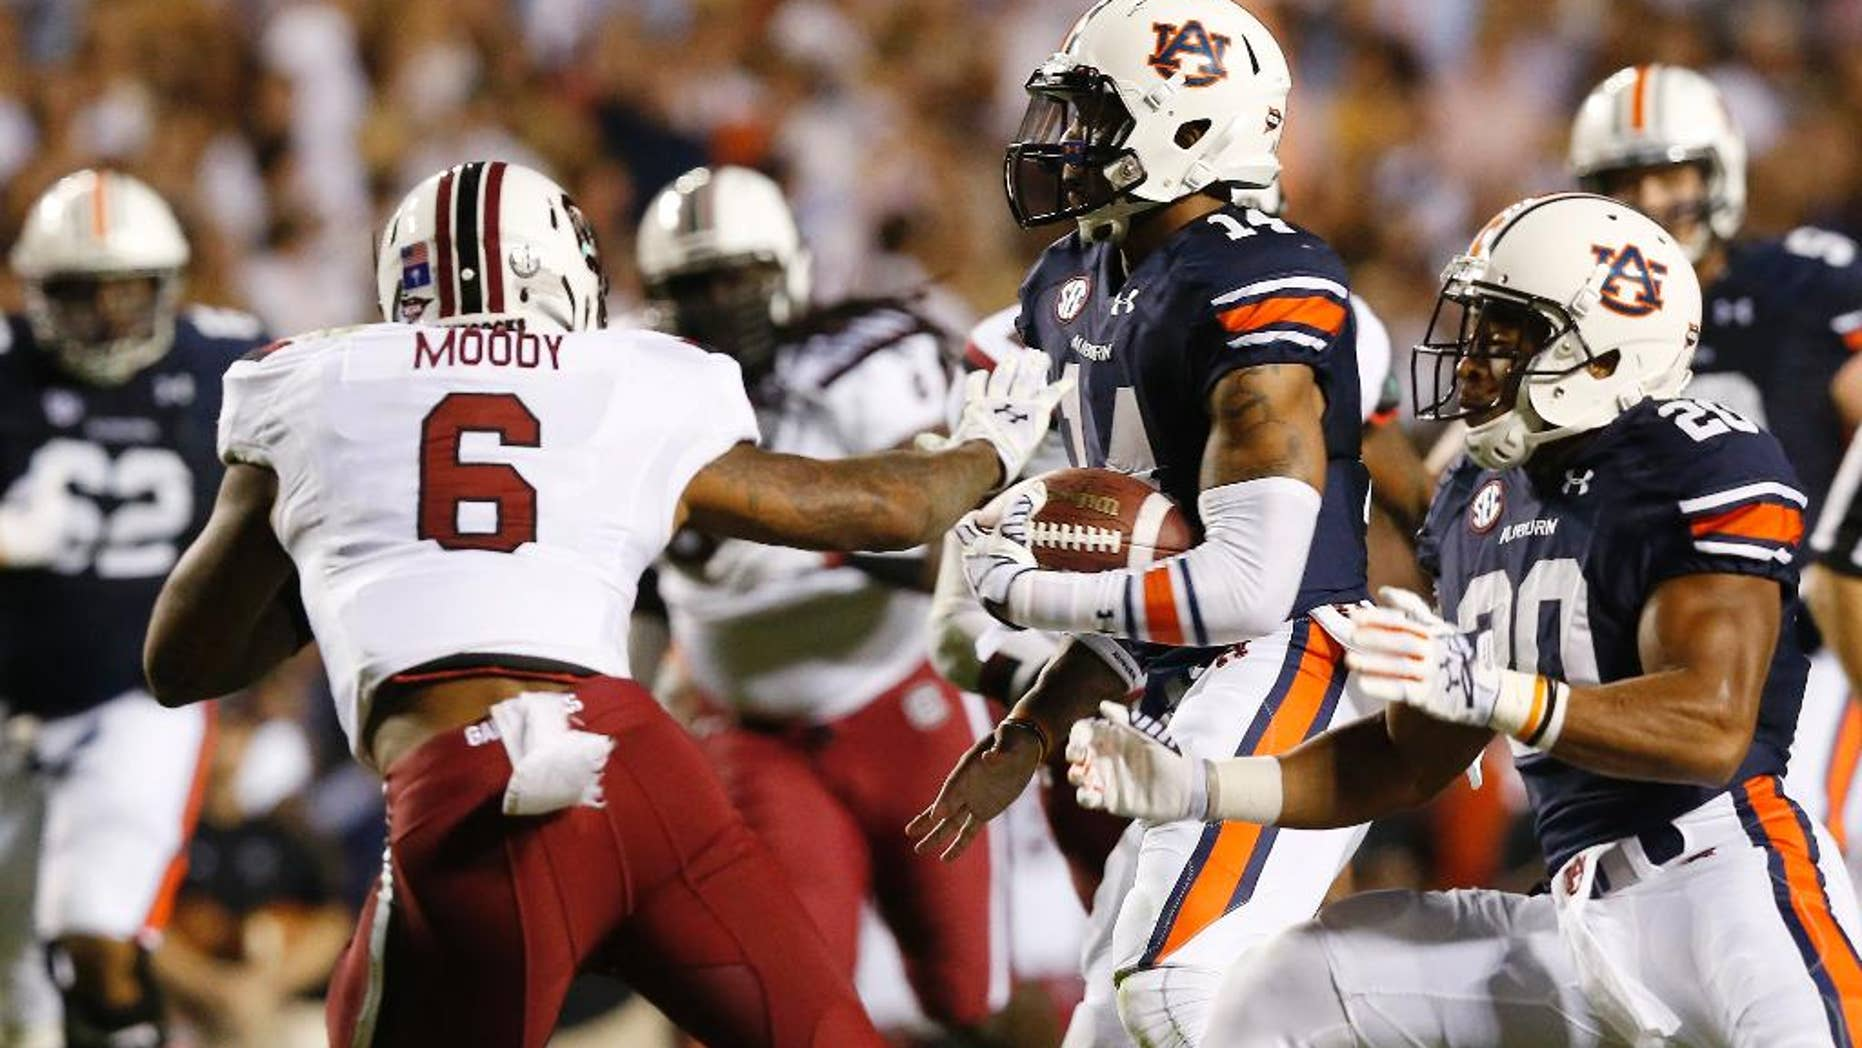 Auburn quarterback Nick Marshall (14) runs the ball in for a touchdown against South Carolina during the second half of an NCAA college football game Saturday, Oct. 25, 2014, in Auburn, Ala. Auburn won 42-35. (AP Photo/Brynn Anderson)